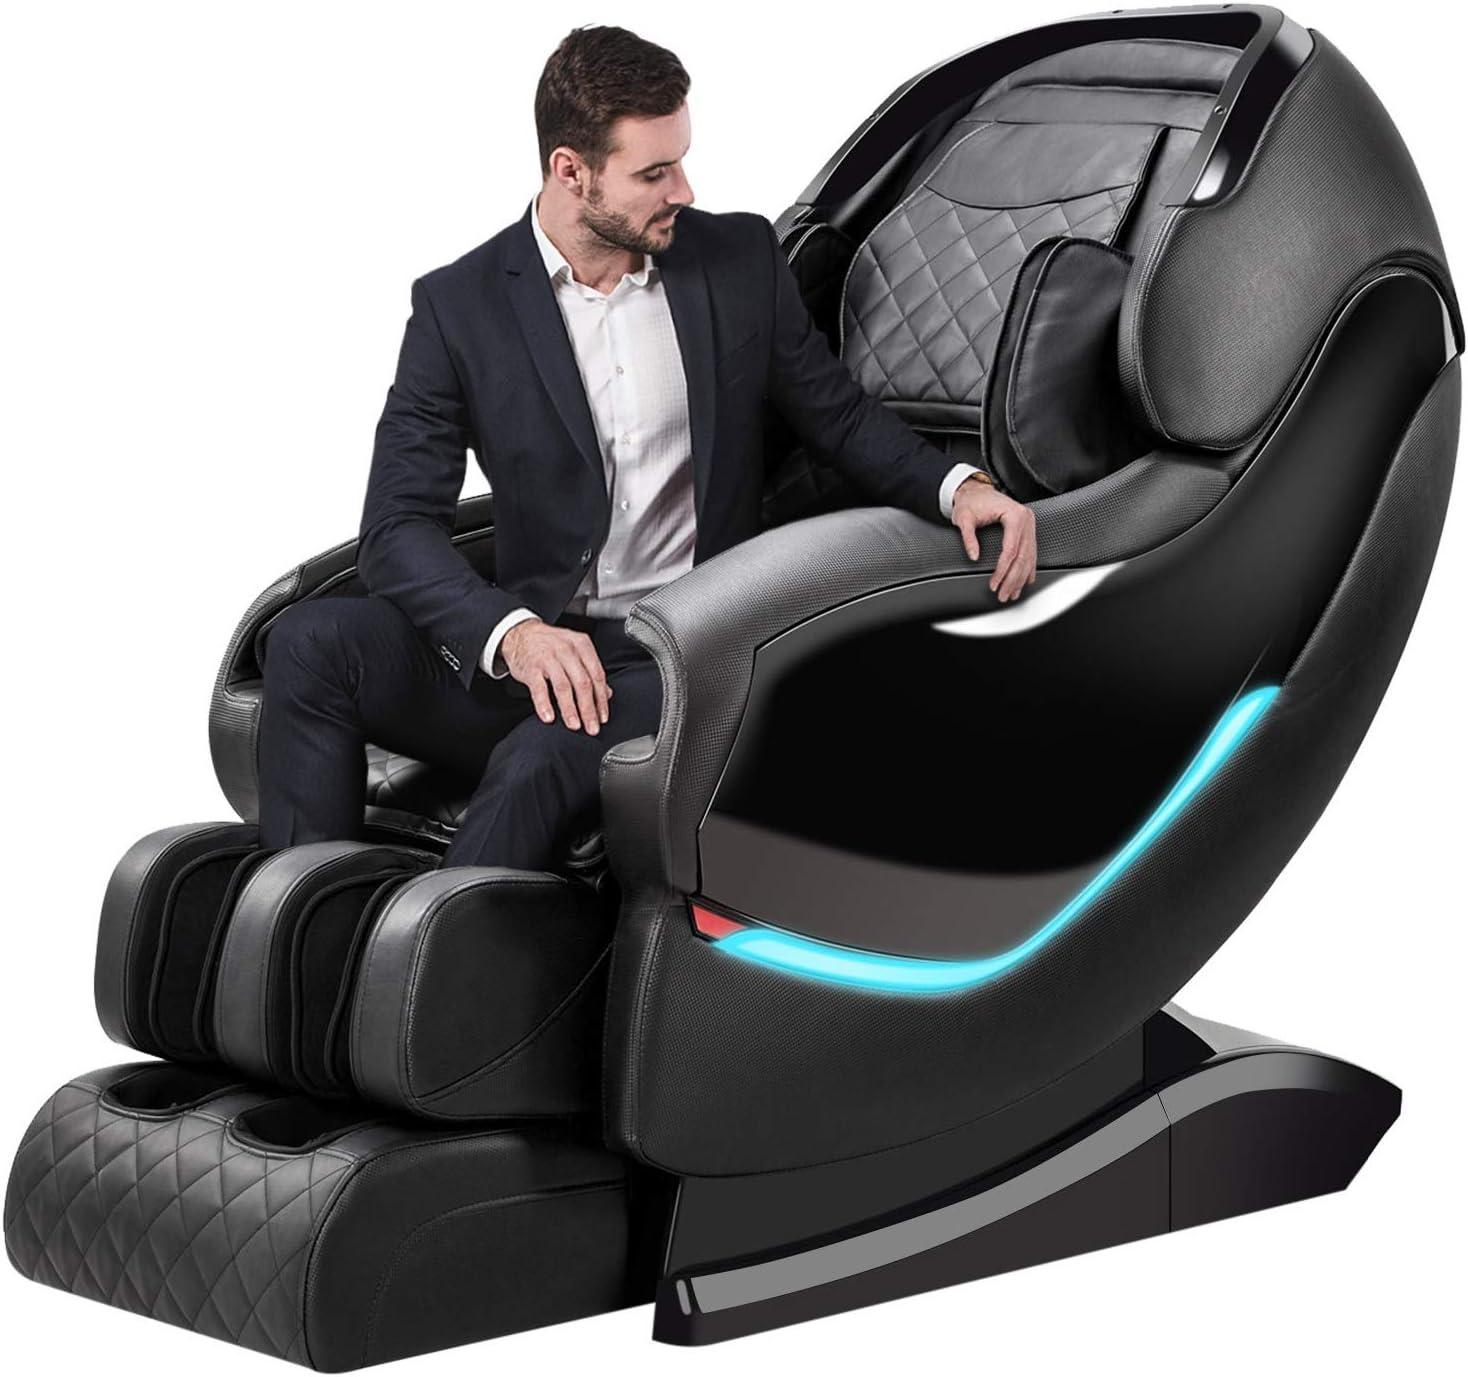 2.Ootori Massage Chair